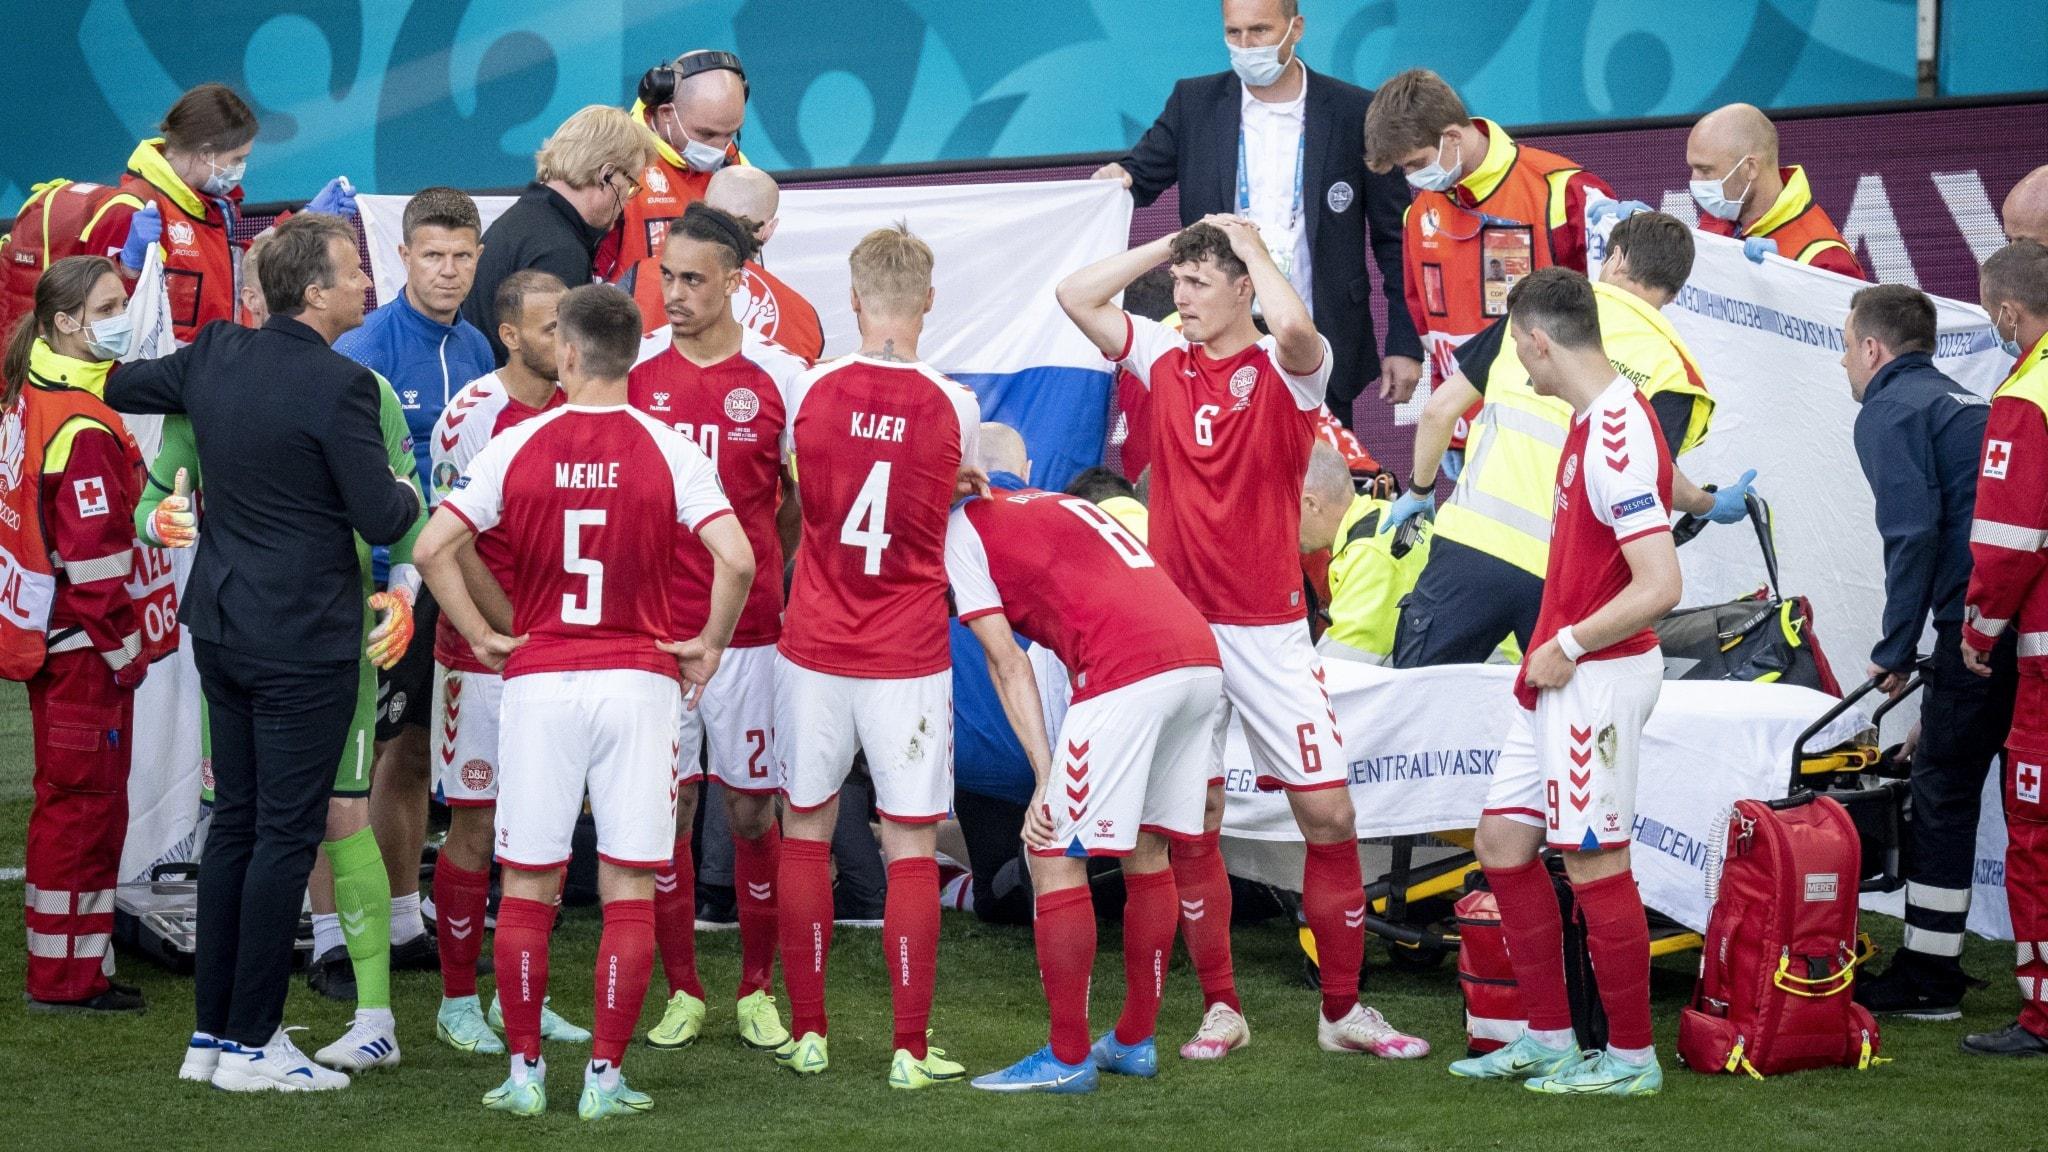 Danmark möter Finland